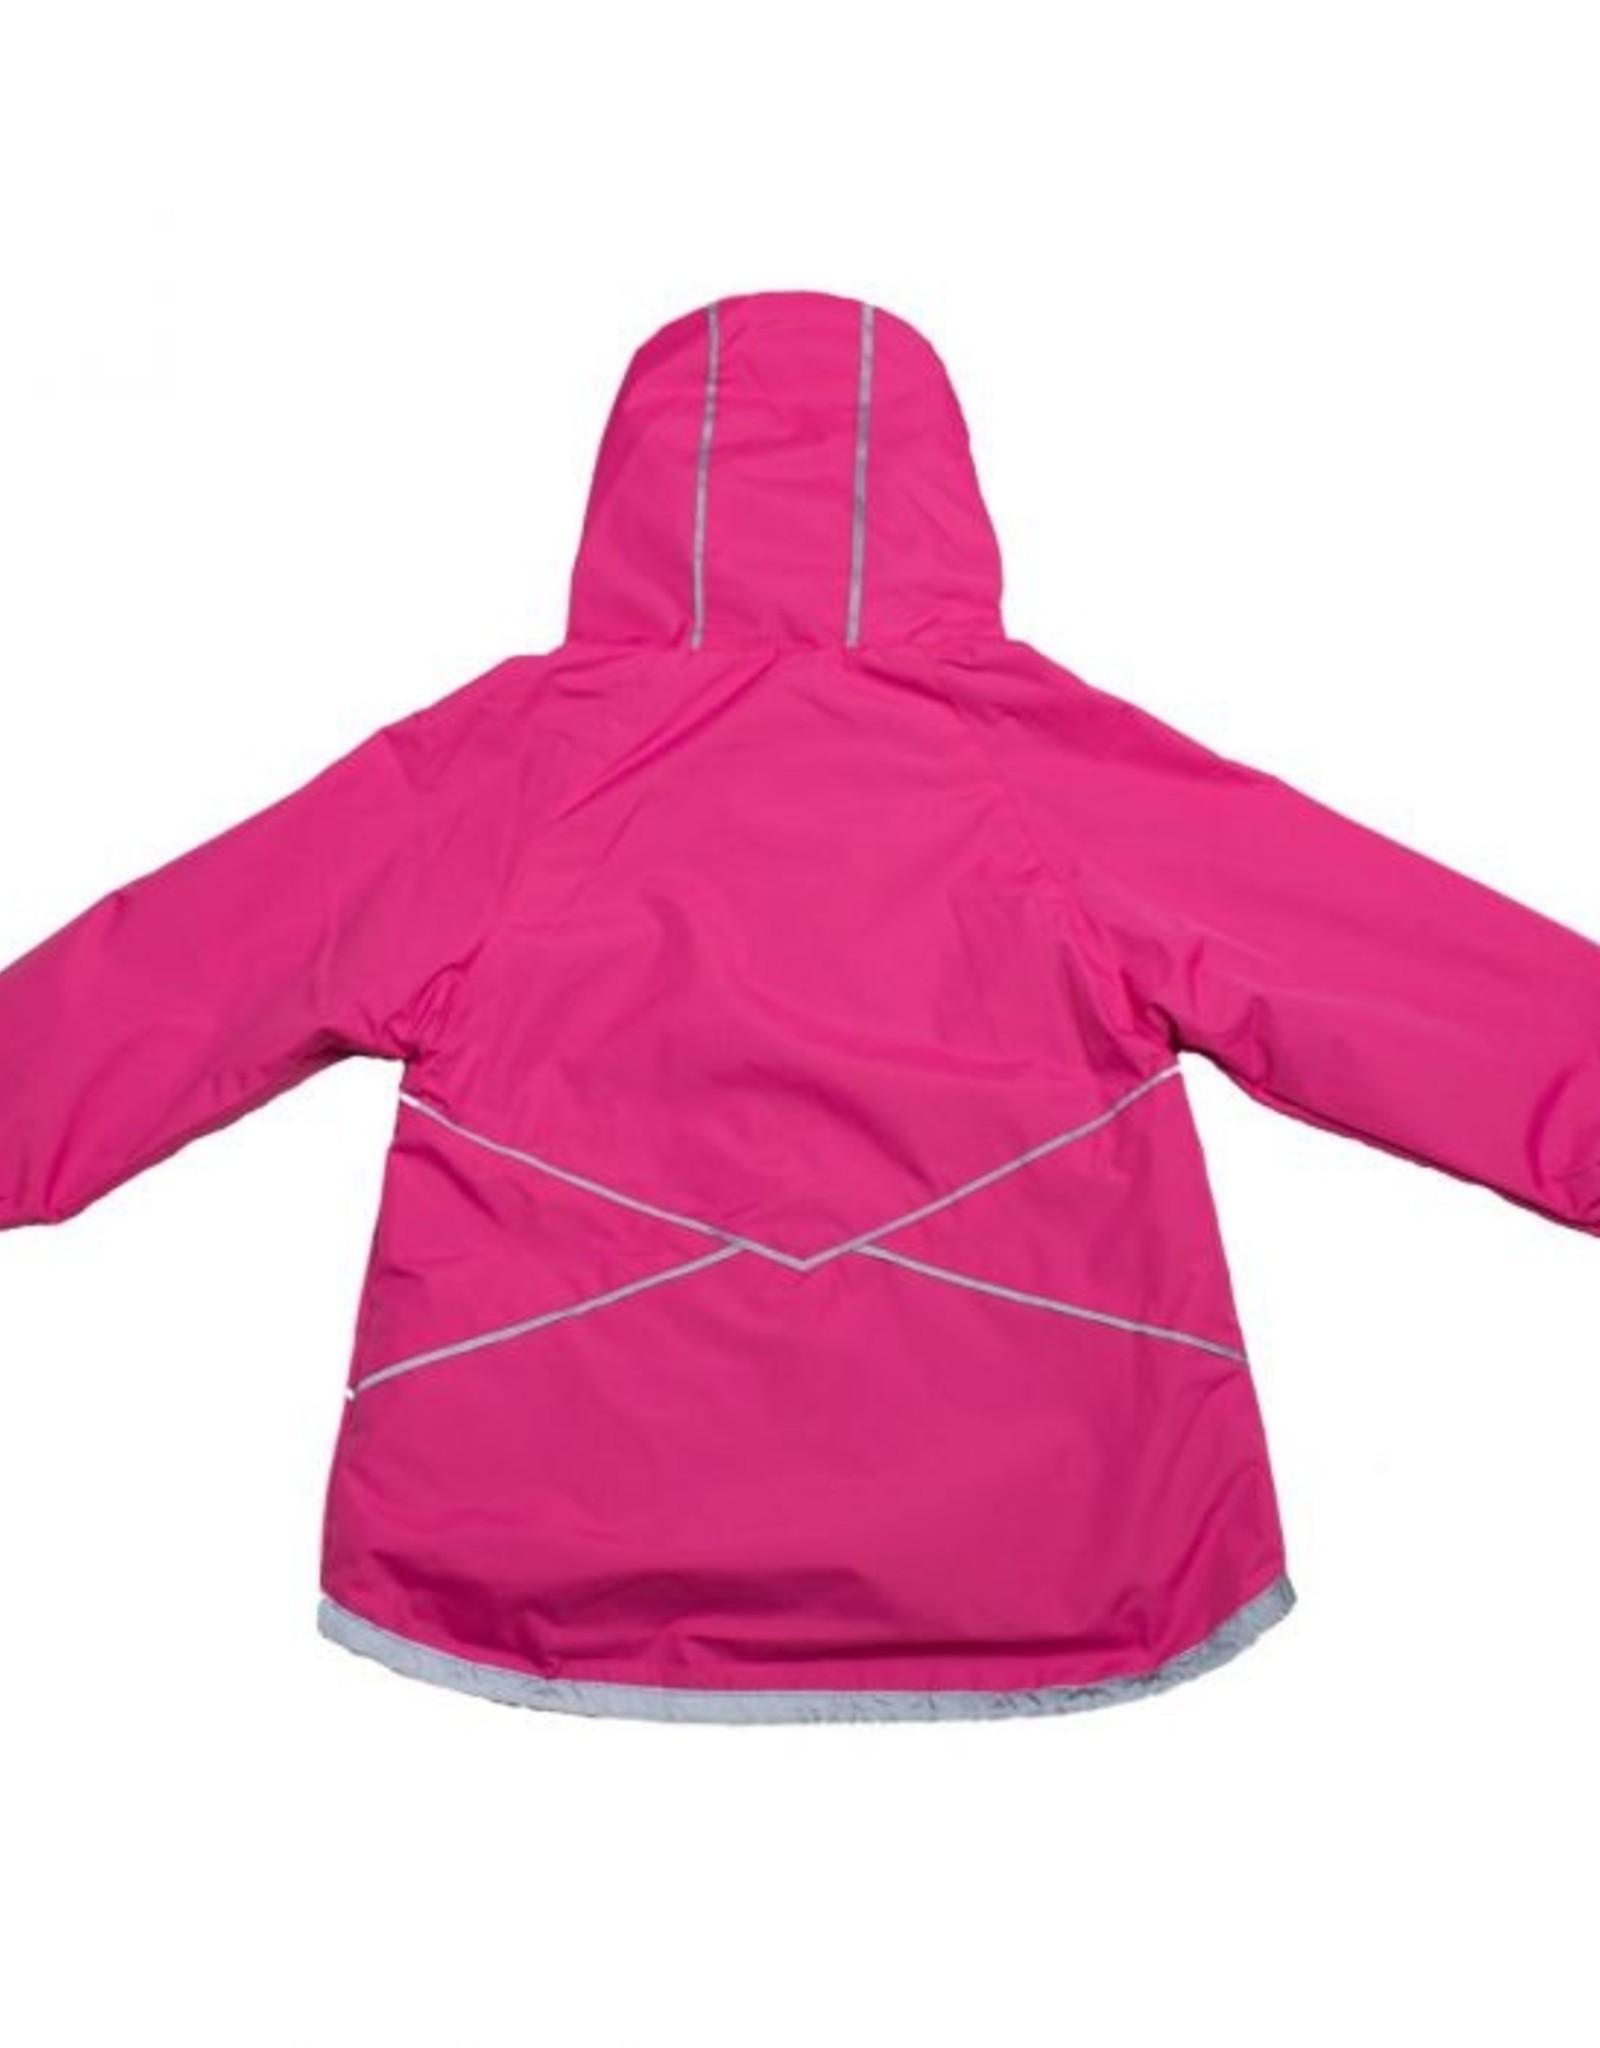 CaliKids FA20 Pink Rain Jacket